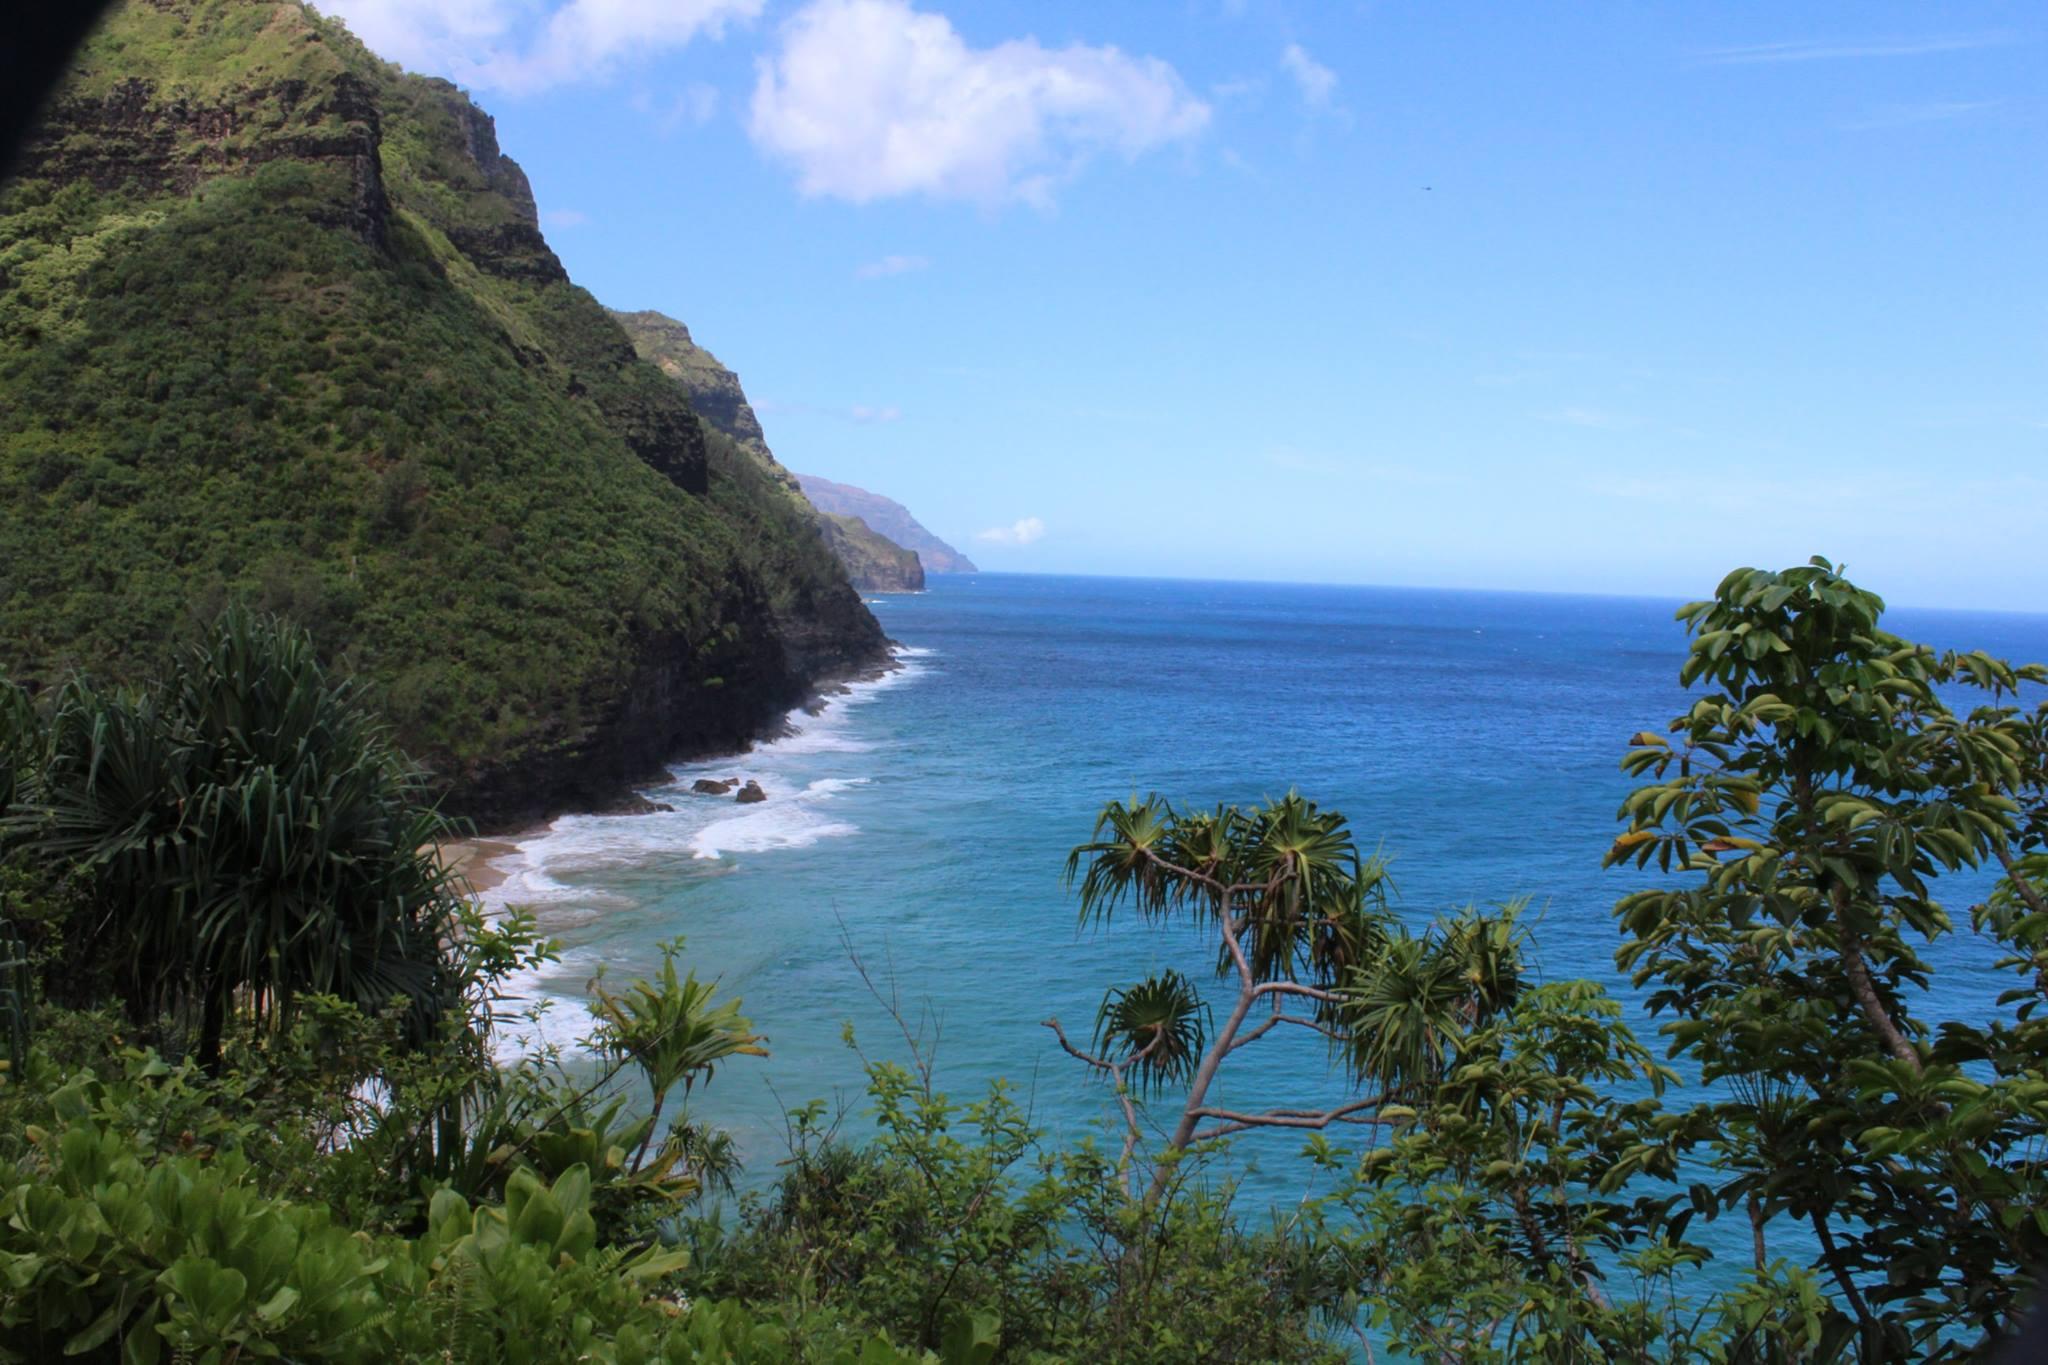 Tips For Hiking The Nā Pali Coast - Kalalau Valley & Trail - CommuniKait